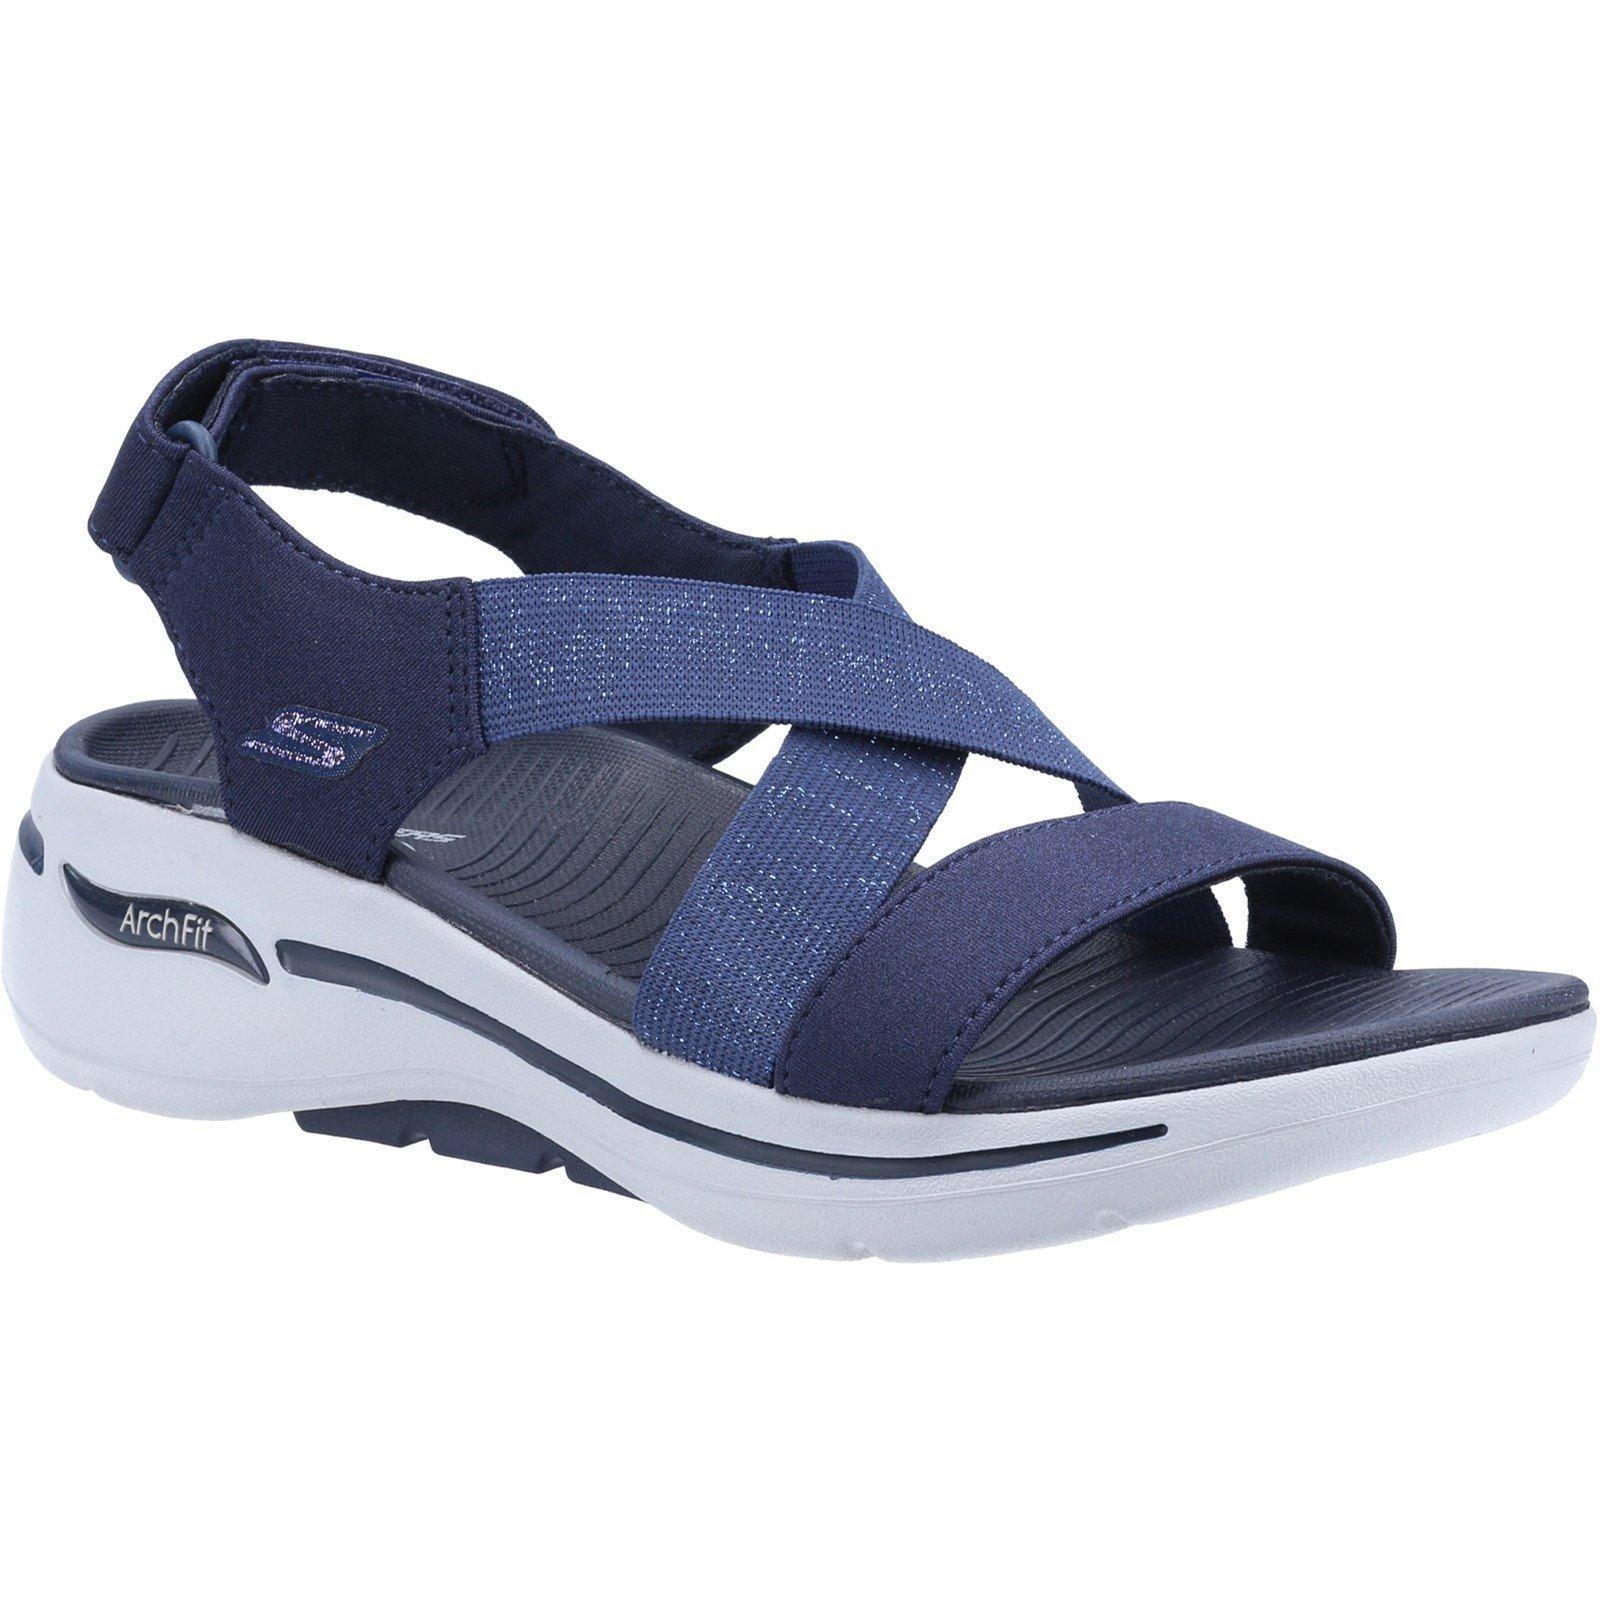 Skechers Women's Go Walk Arch Fit Astonish Summer Sandal Various Colours 32153 - Navy 3